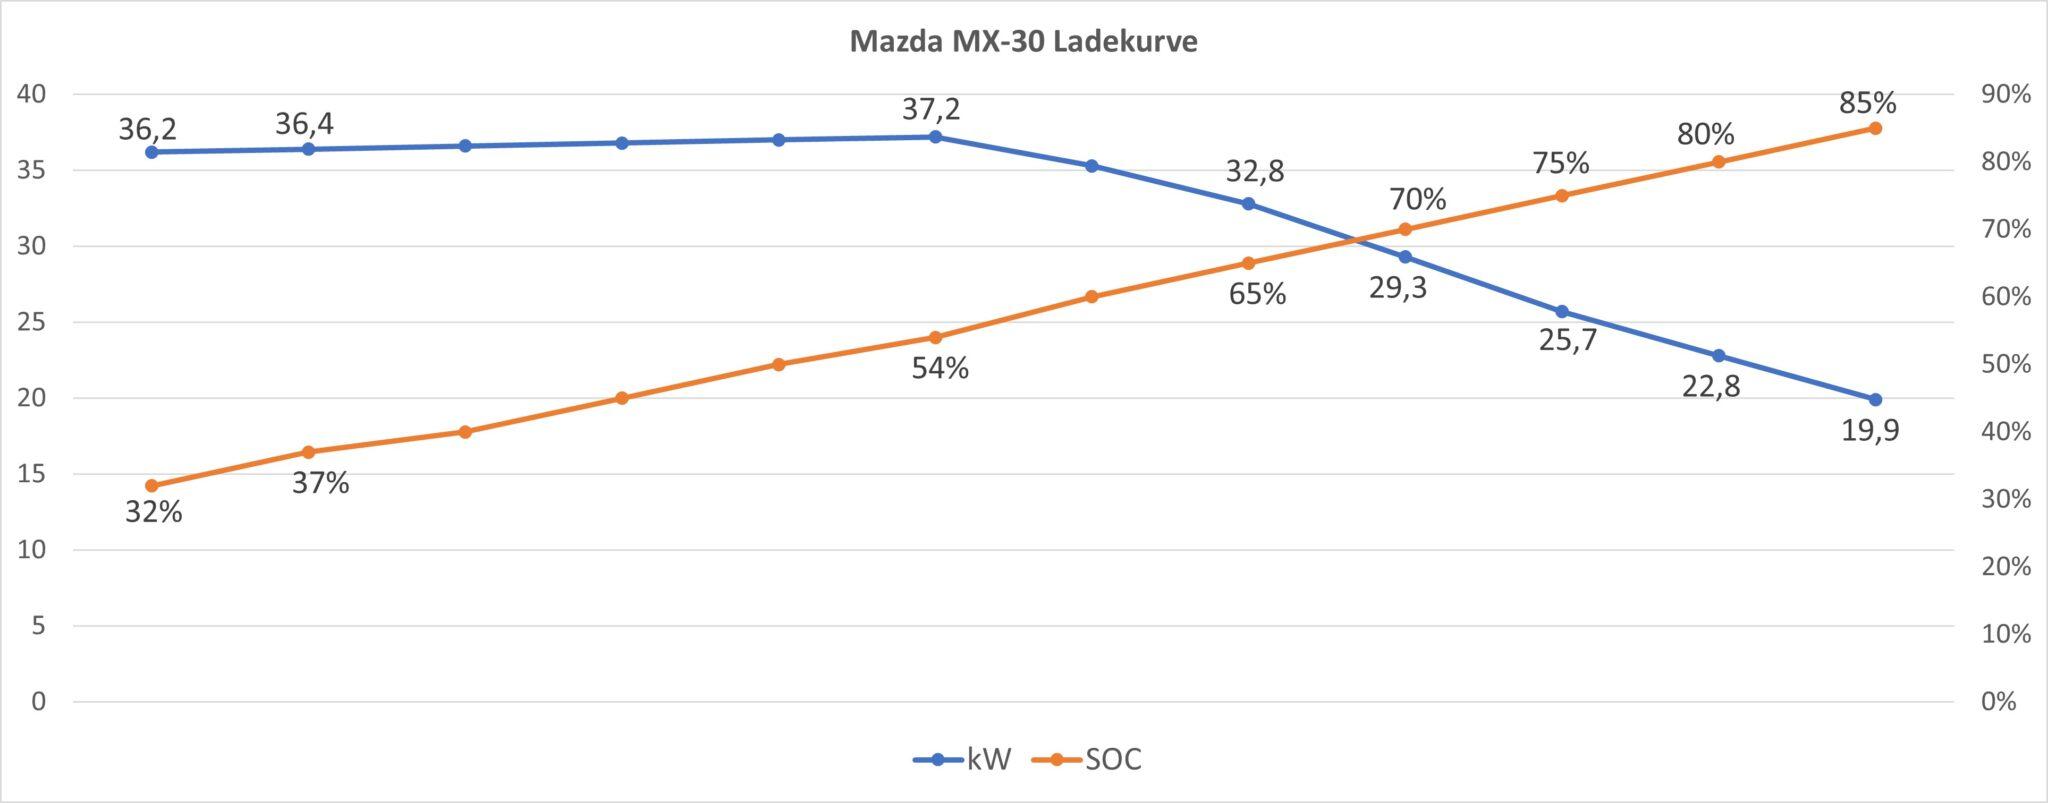 Mazdas MX-30 - Testbericht | Ladekurve Mazda MX 30 scaled